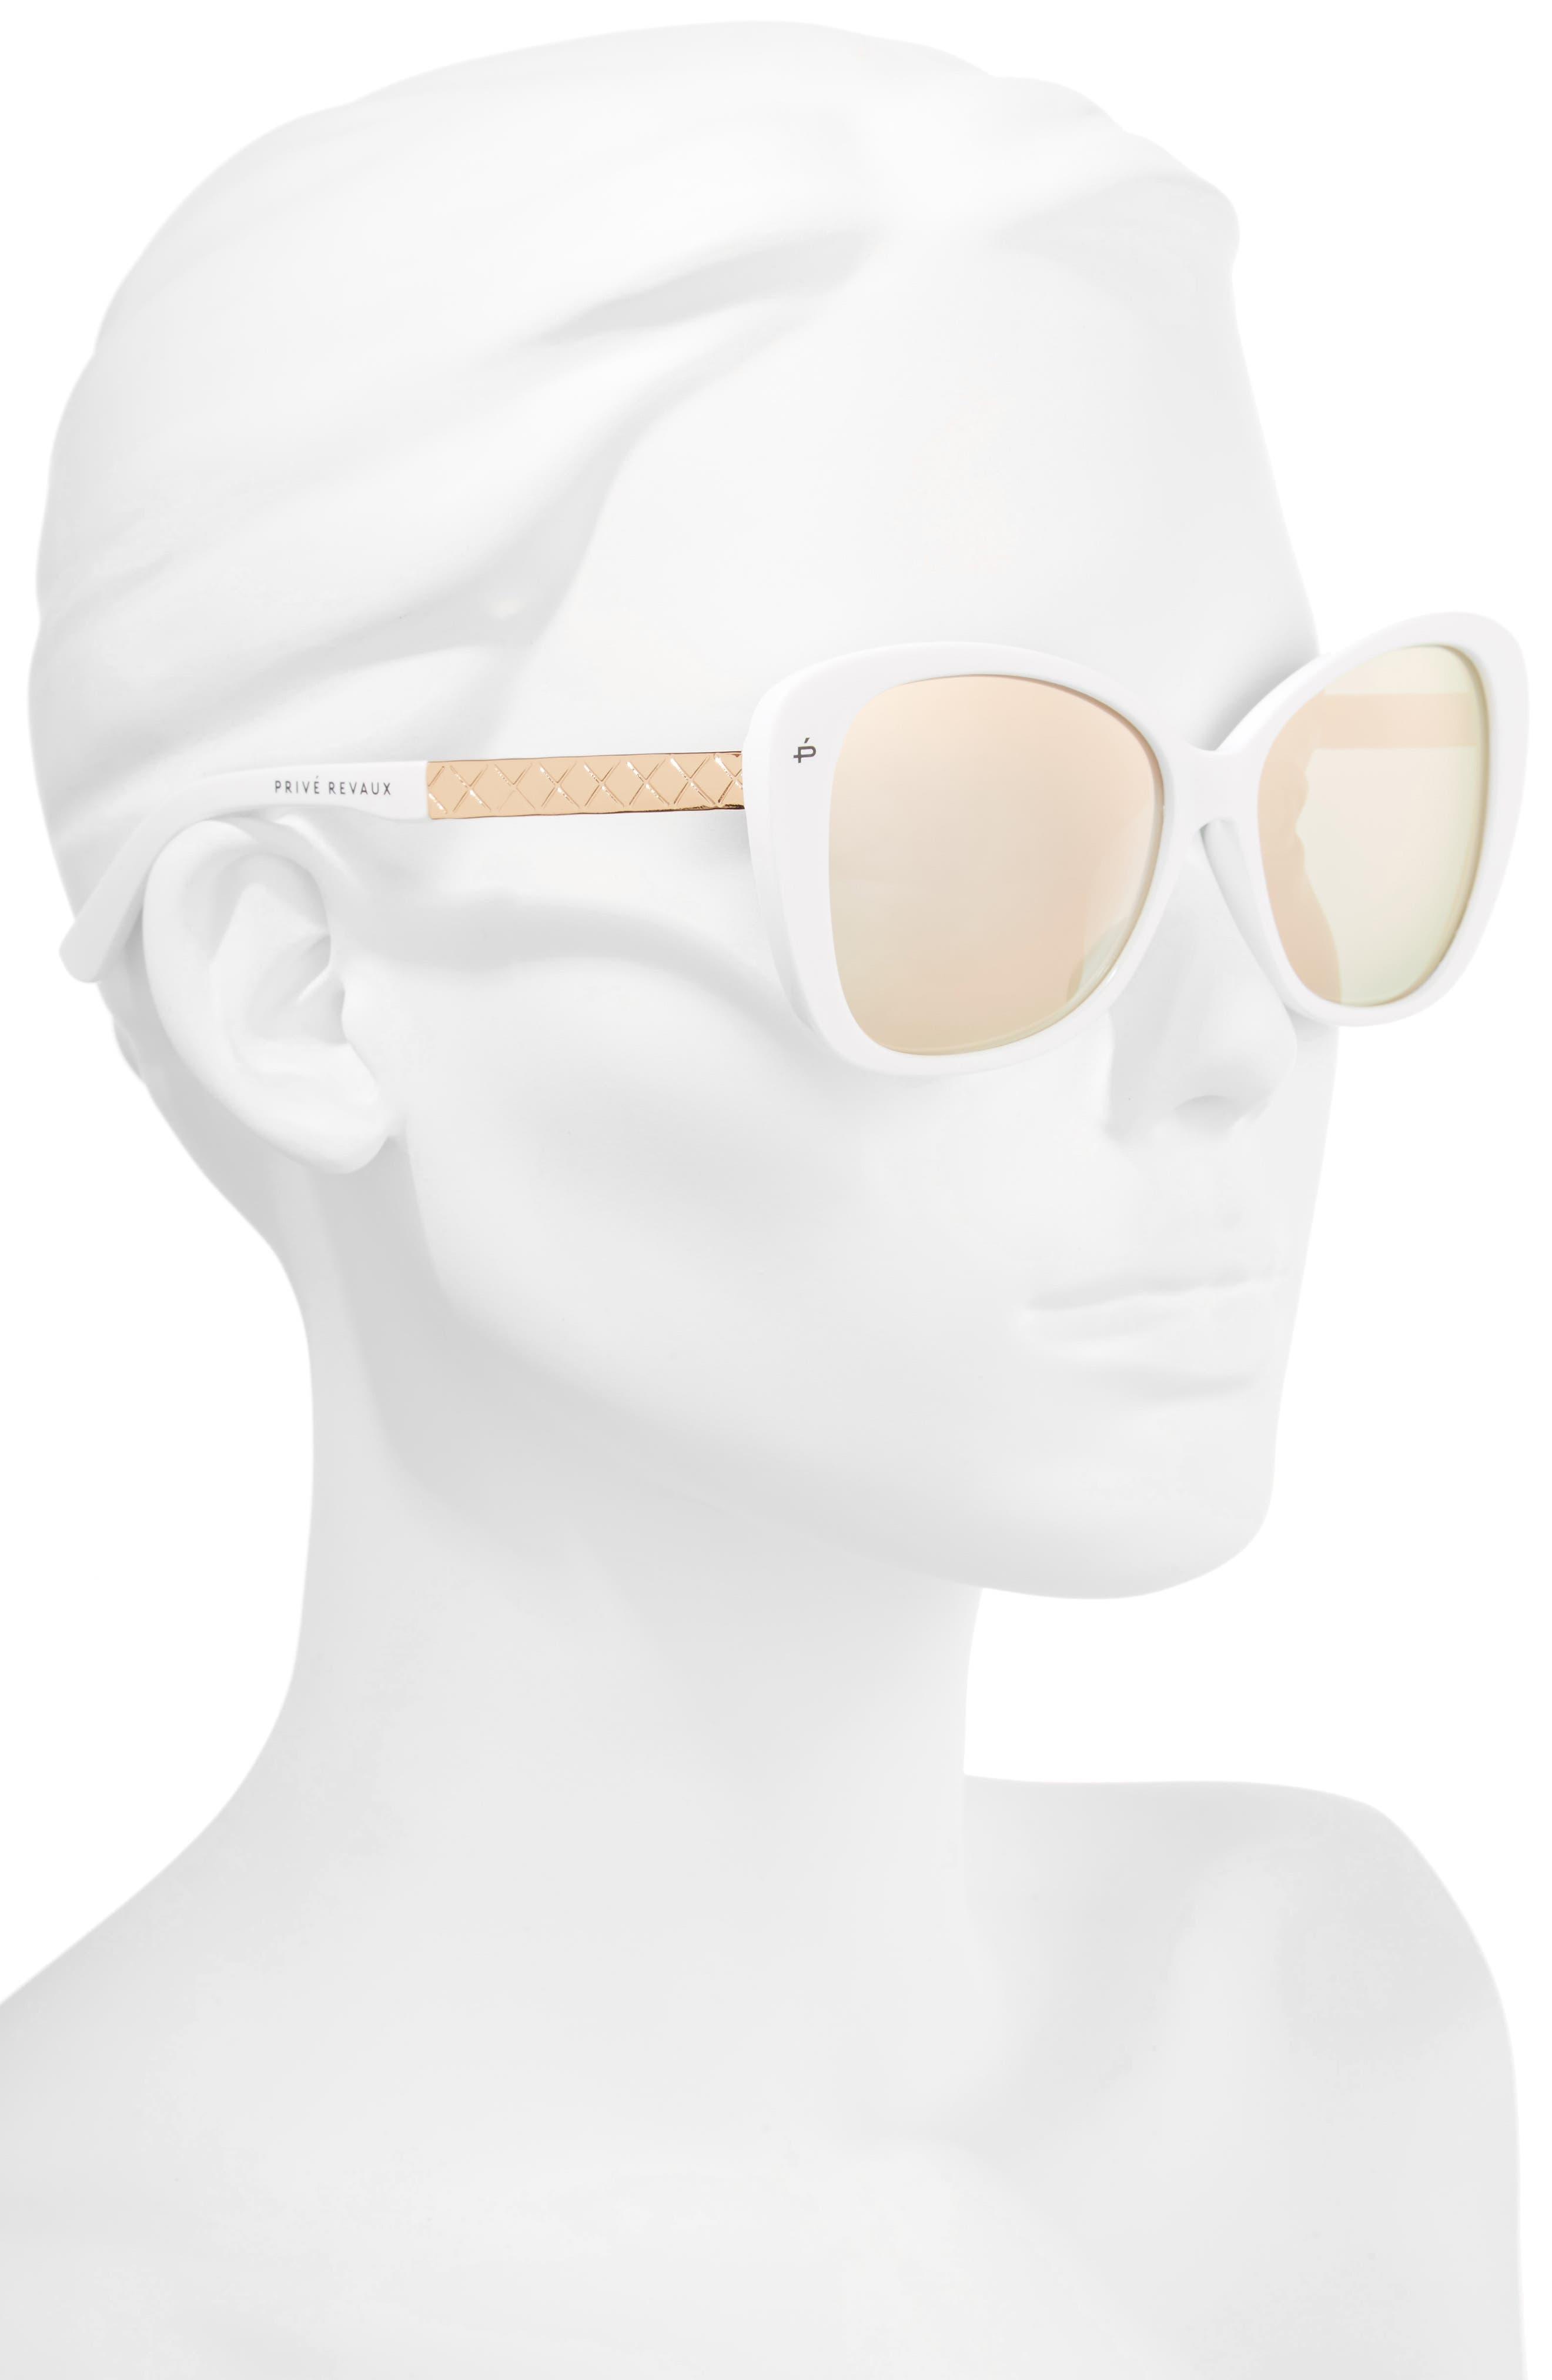 Privé Revaux The Jackie O 56mm Cat Eye Sunglasses,                             Alternate thumbnail 2, color,                             White Polarized